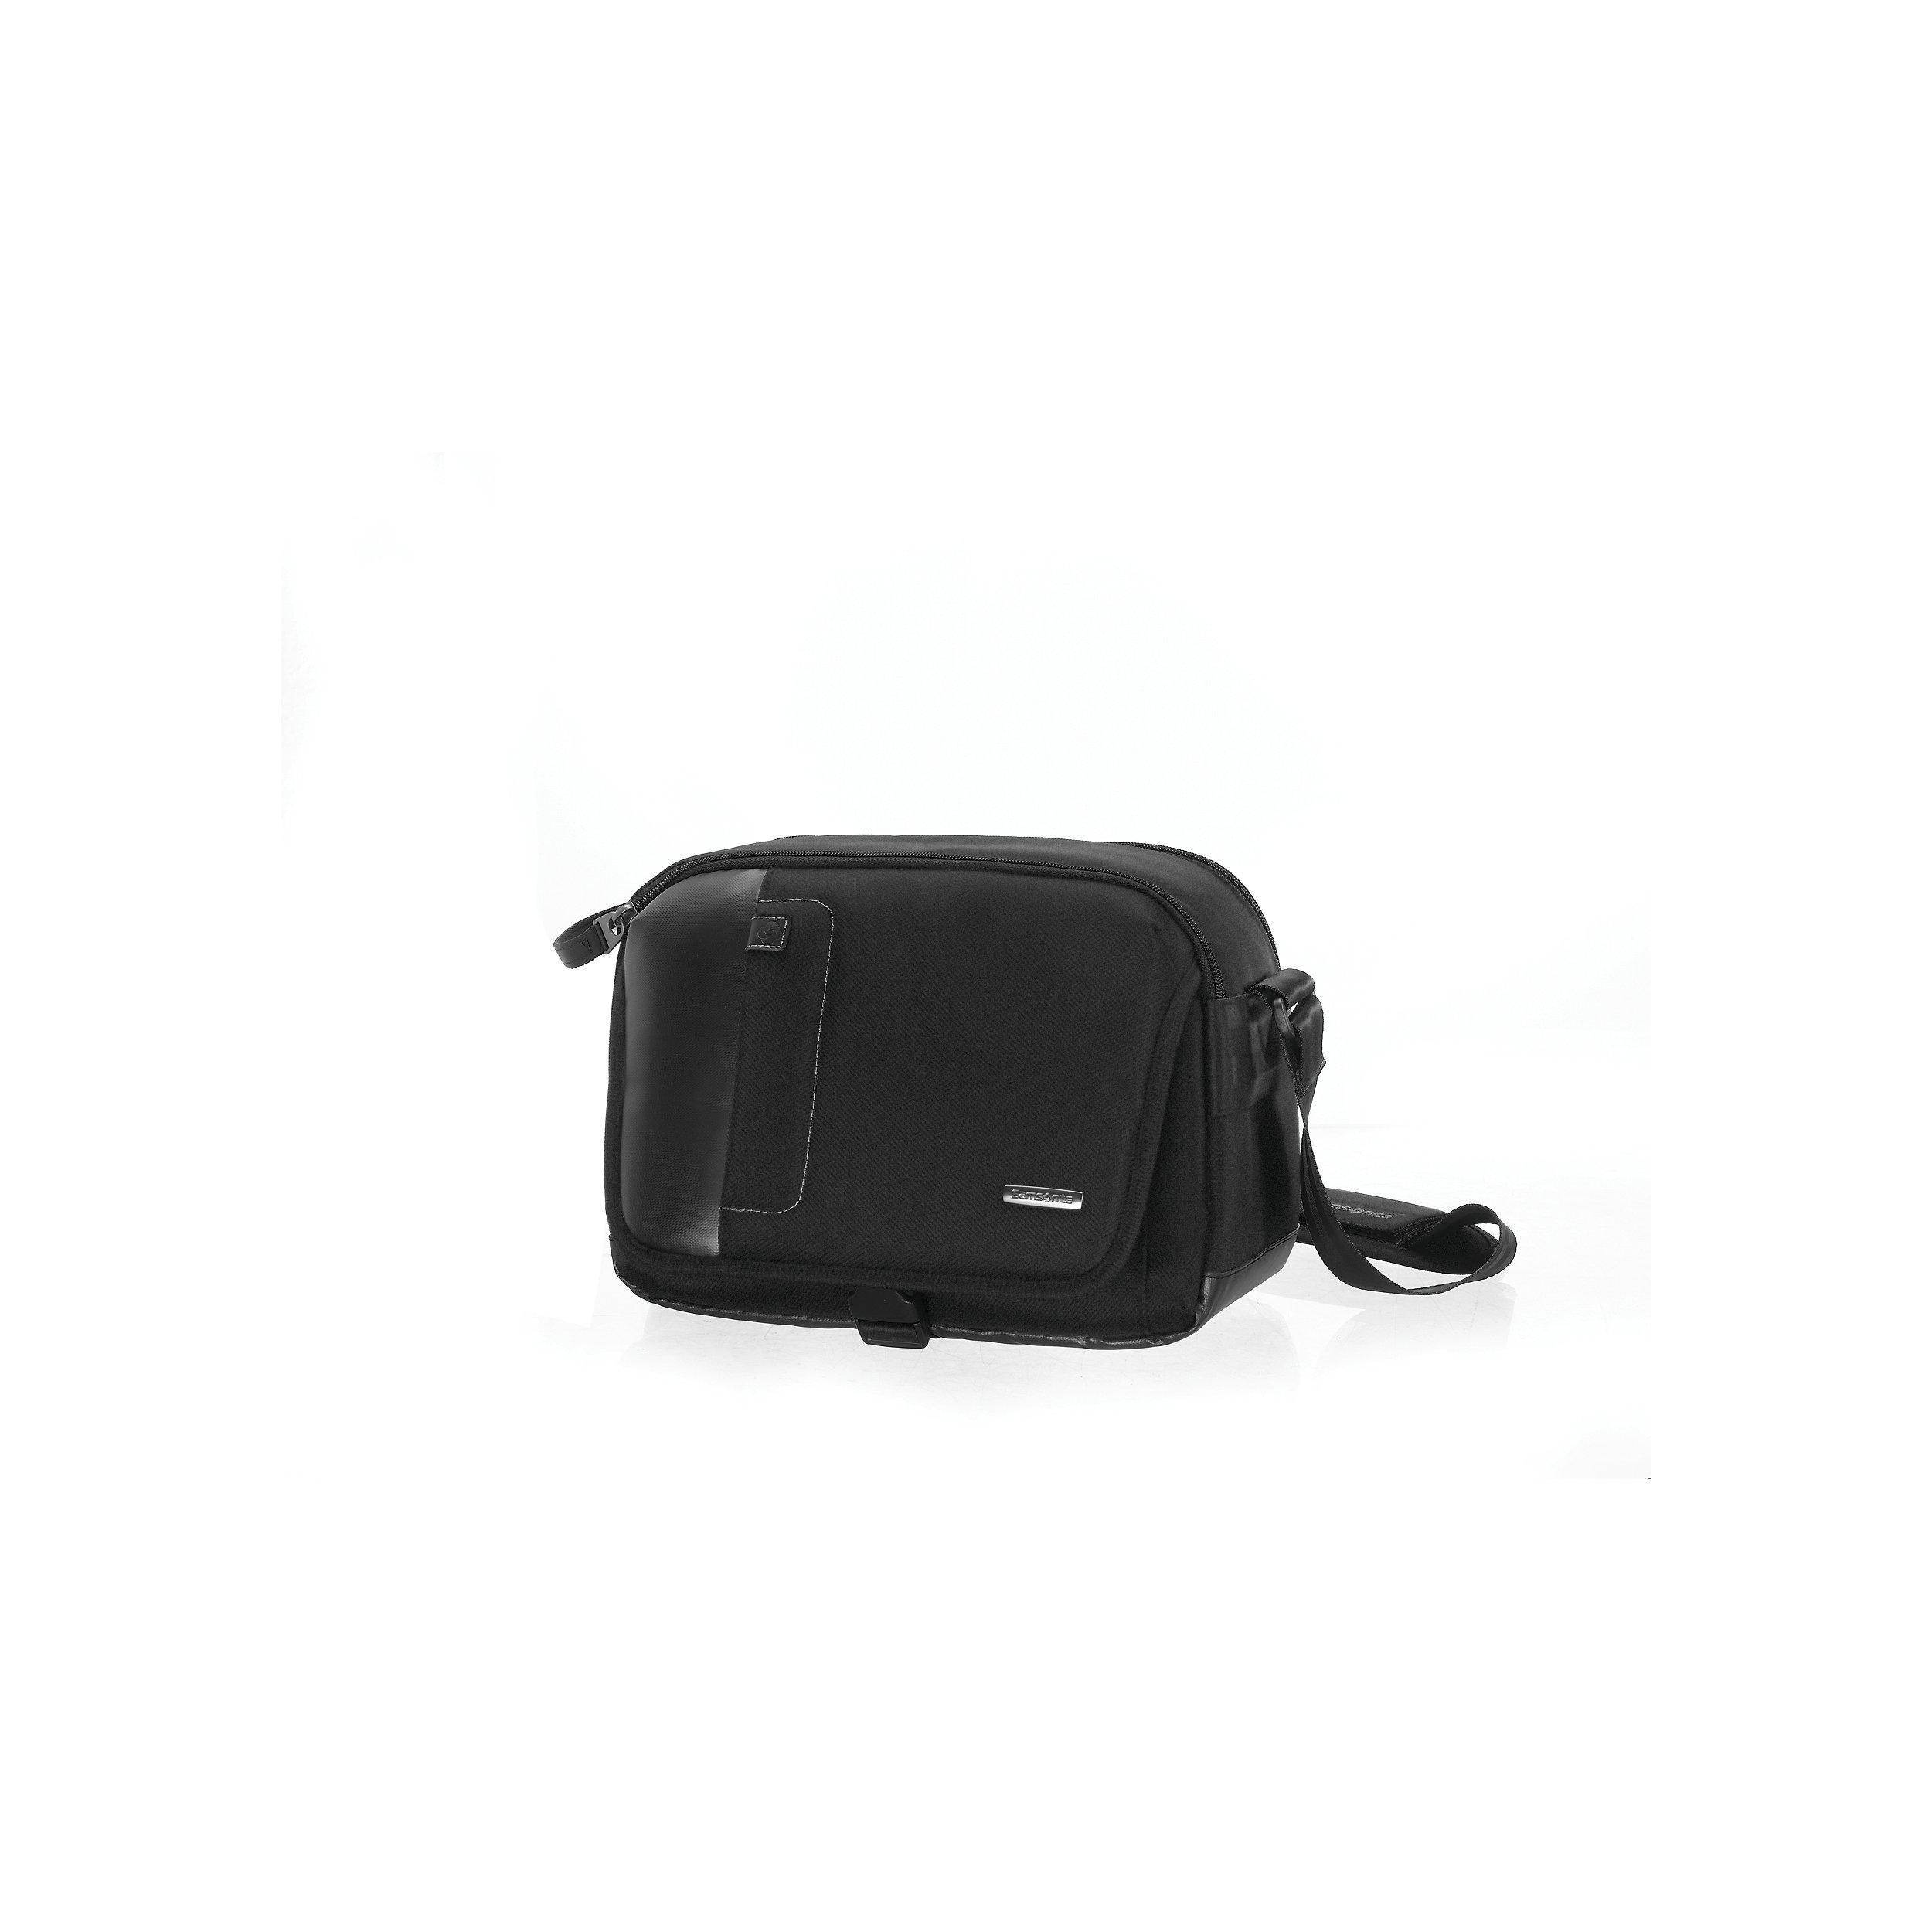 Shoulder Bag 100 Fotonox 6.5 Liter